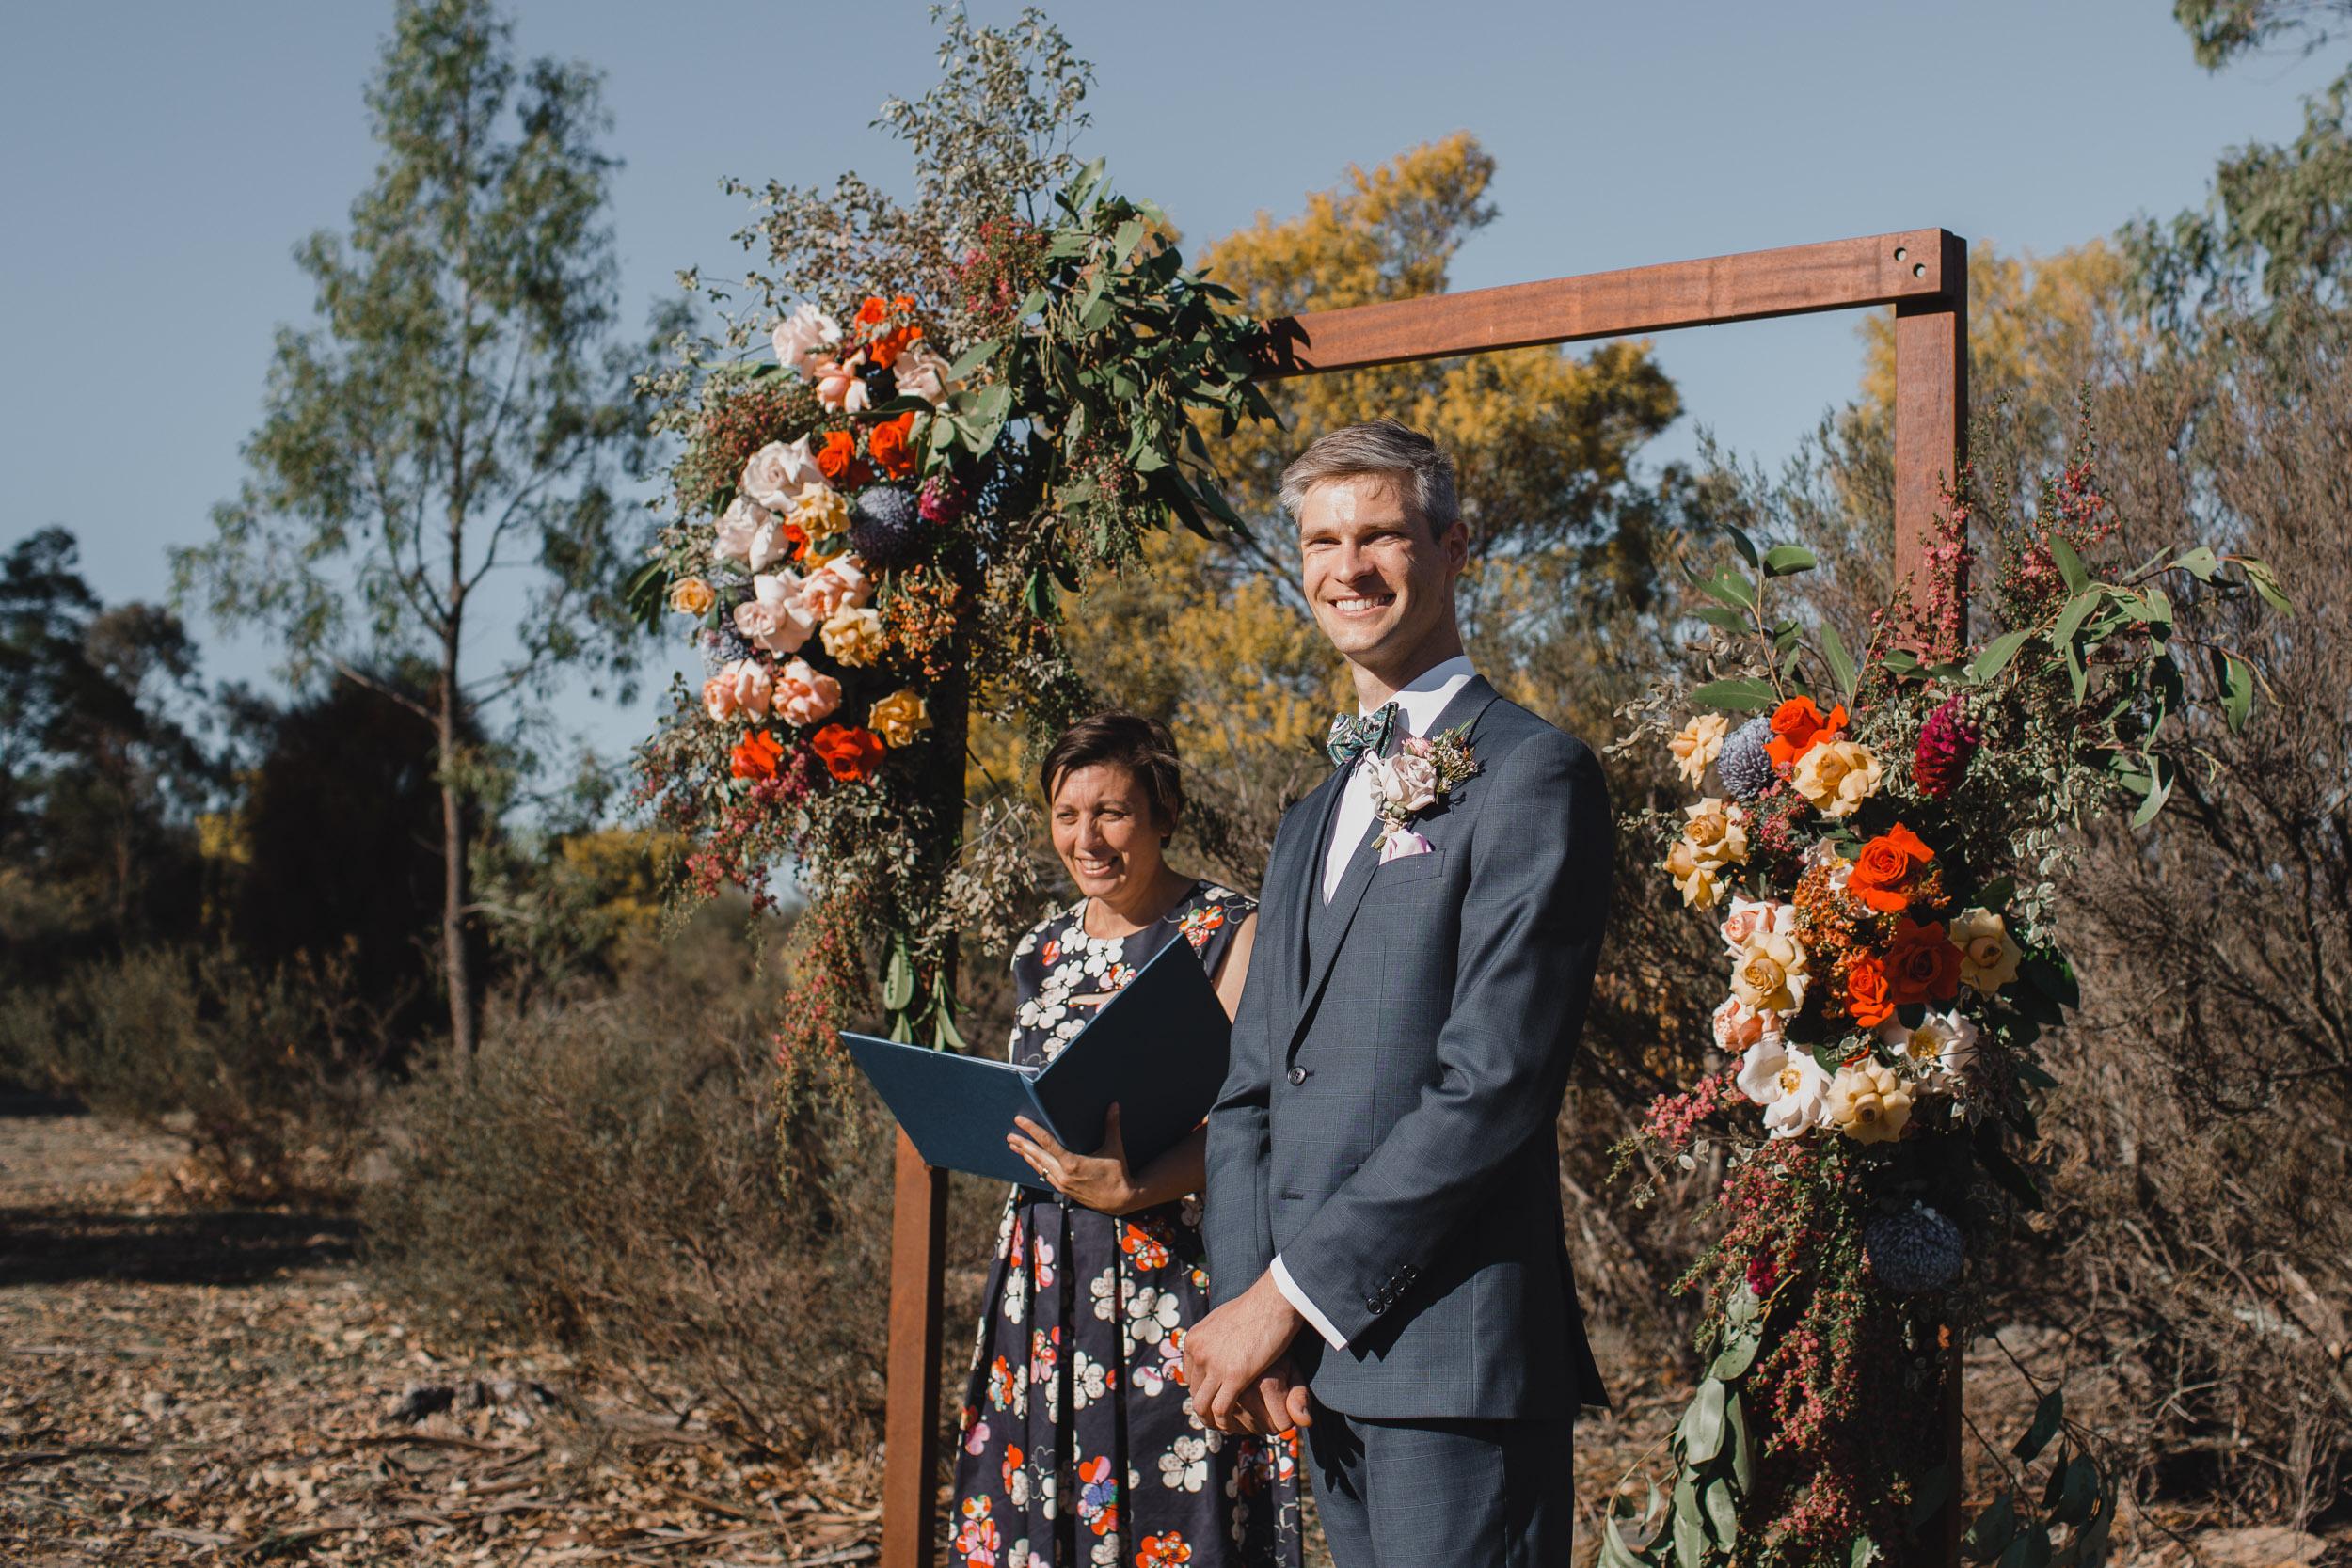 Folkstone-JeremyBek-Wedding-Web-123.jpg